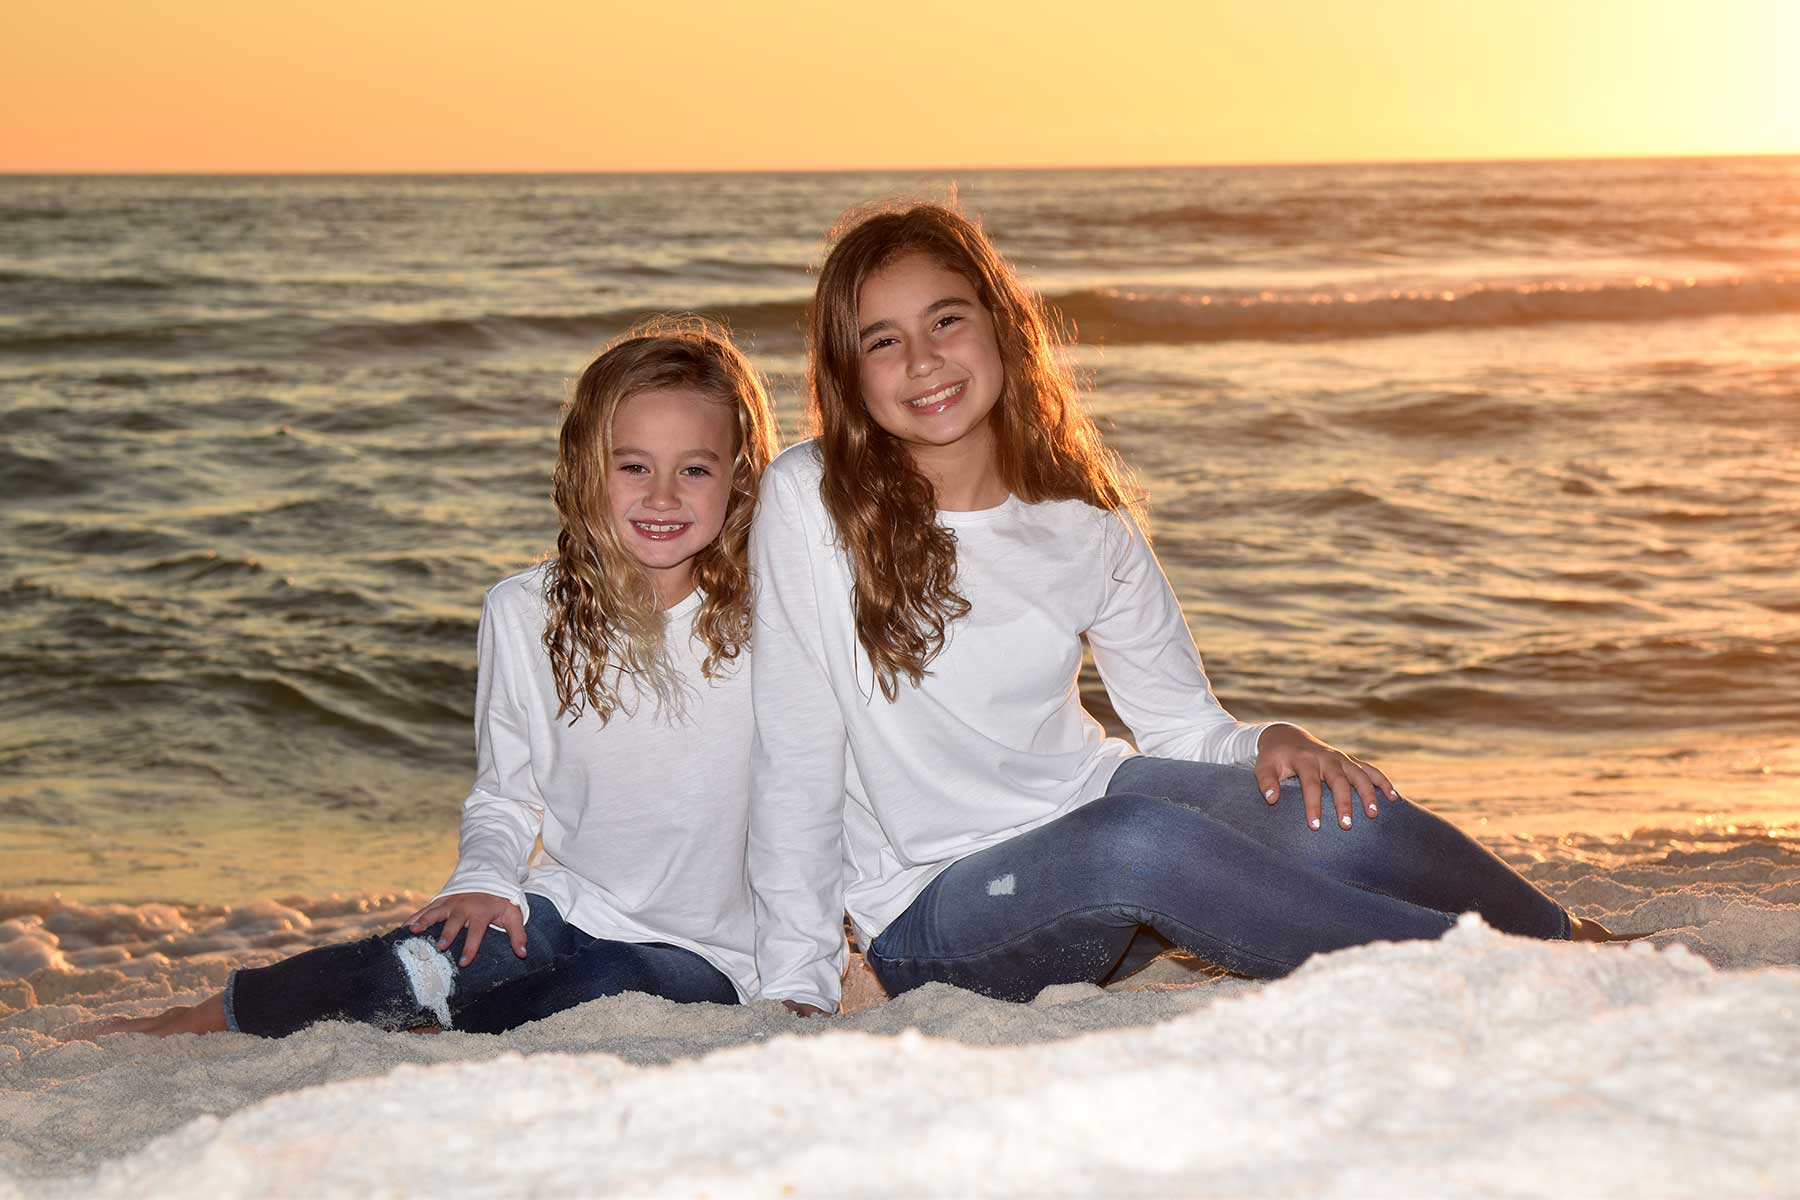 2 kids in a sunset beach photo